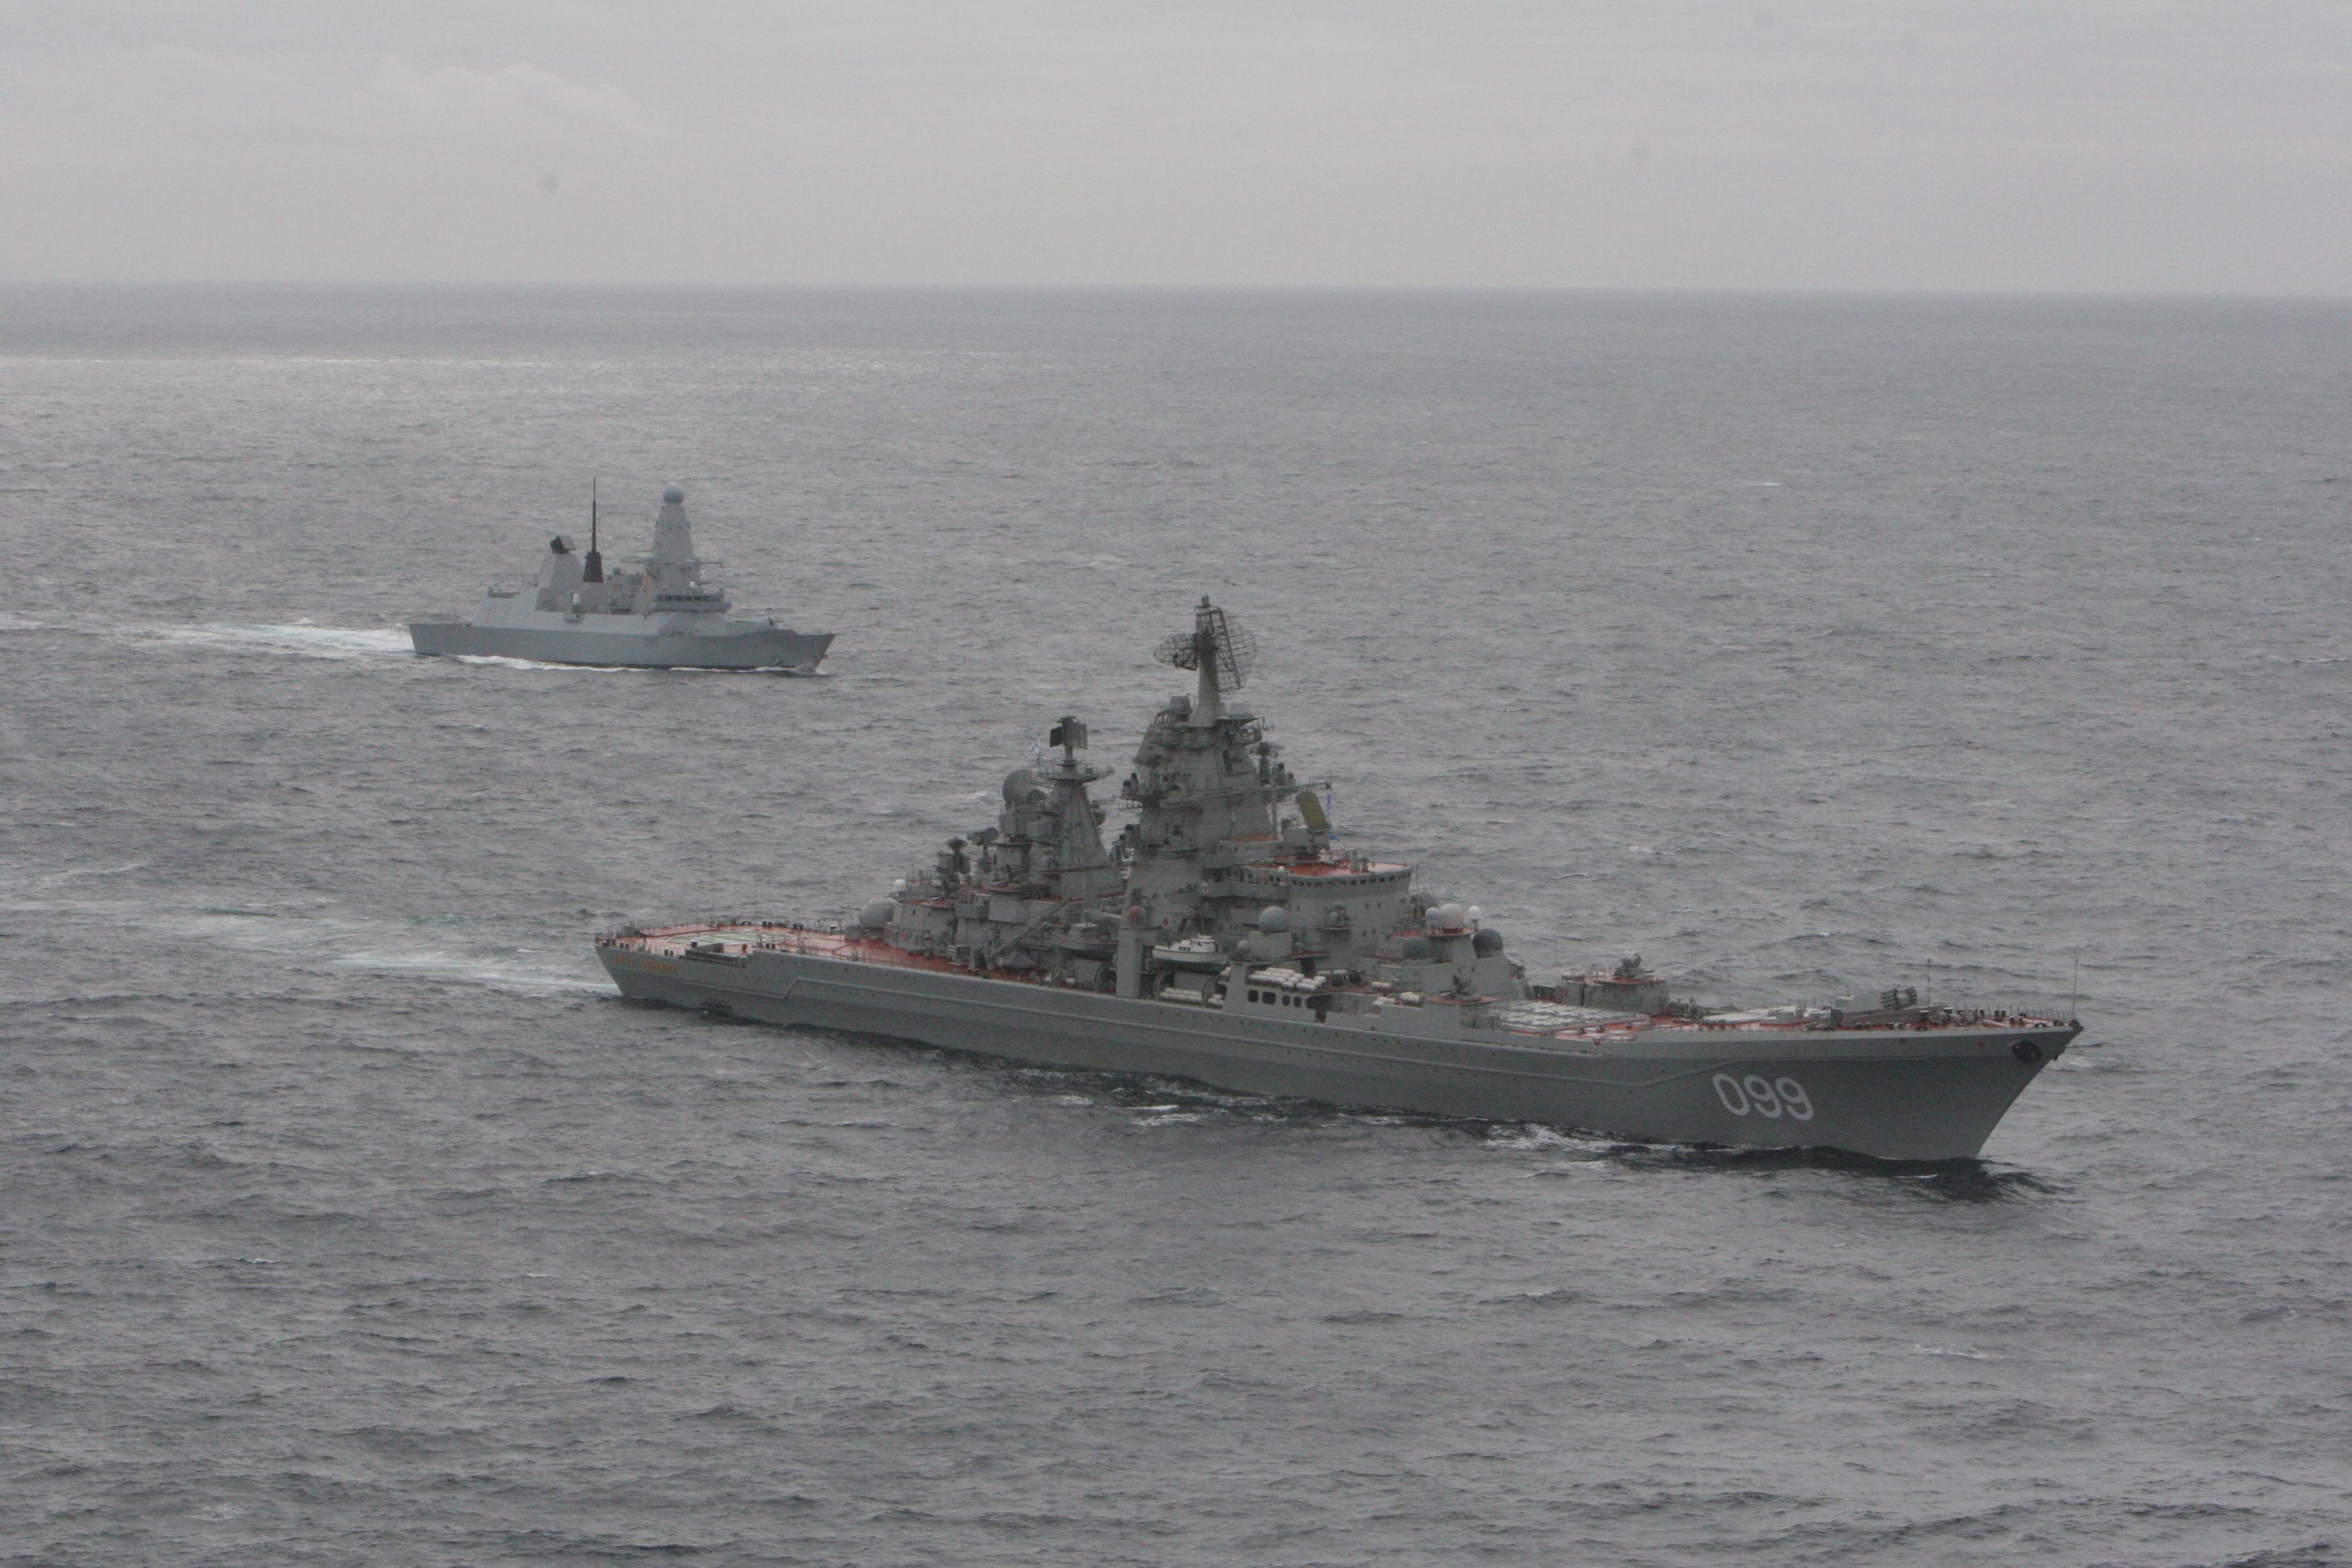 HMS_Dragon_with_Kirov_Class_'Pyotr_Velik